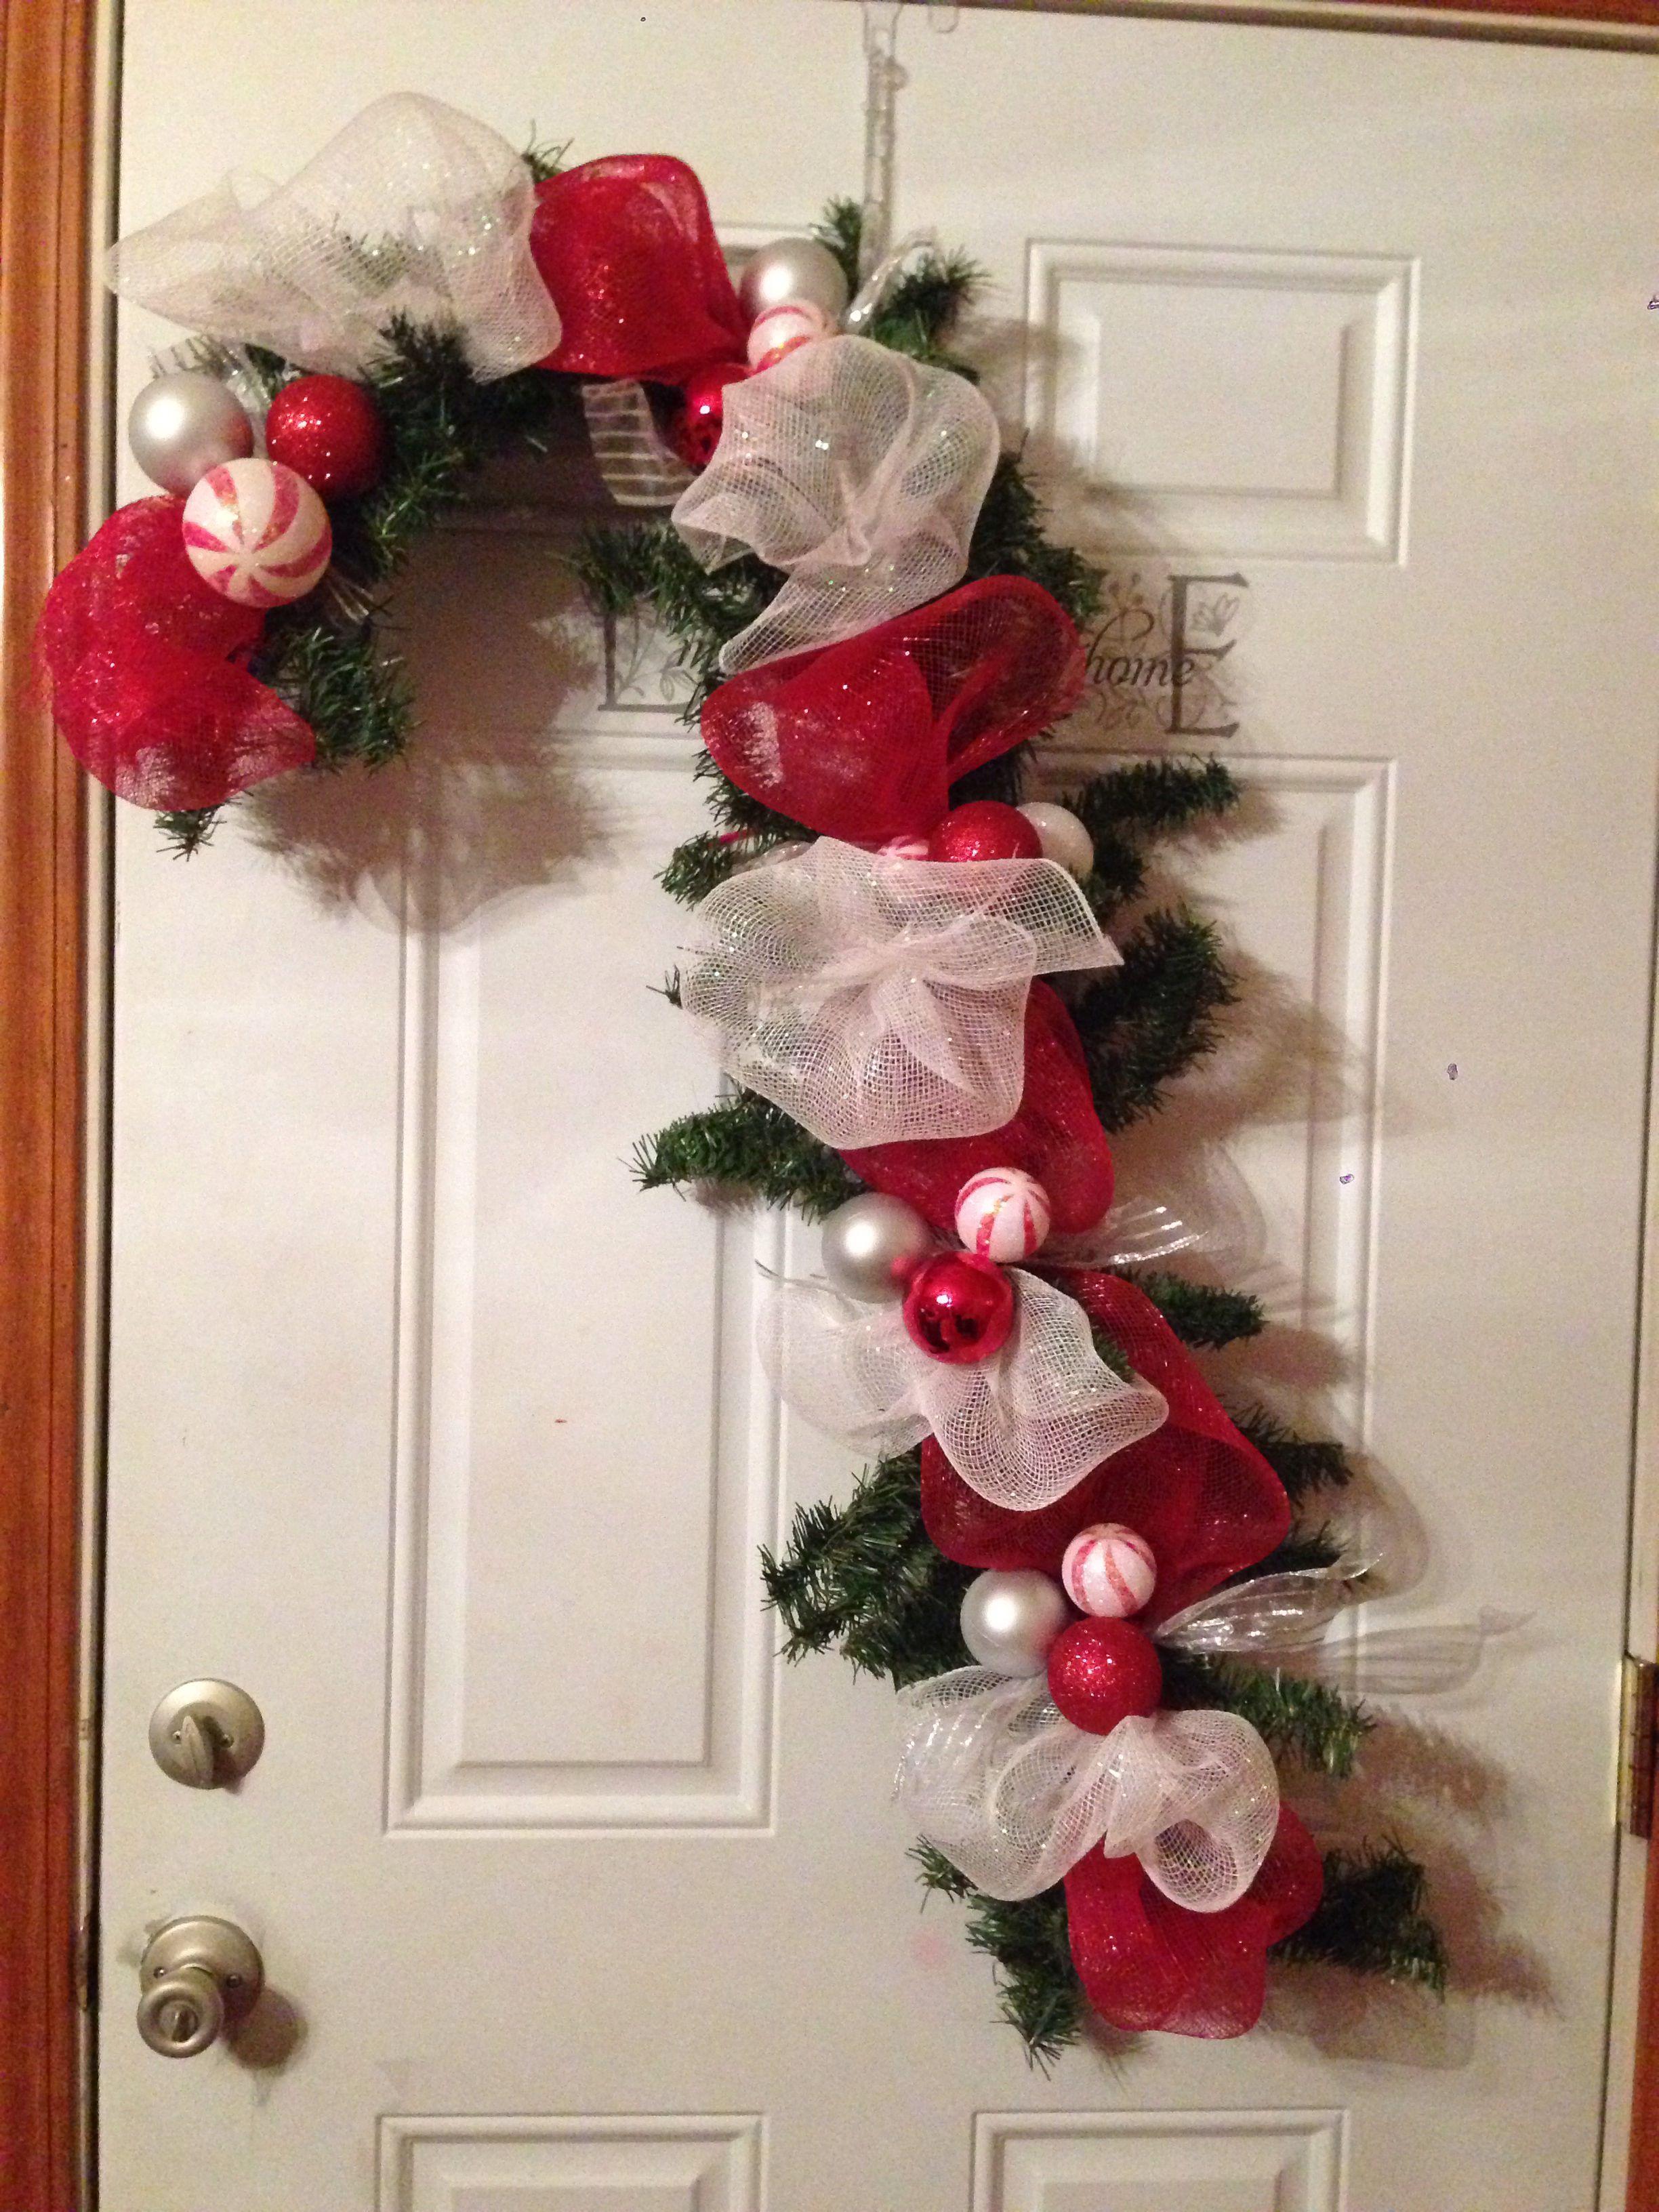 Candy Cane Christmas Decor For Outdoor Columns Christmas Wreaths